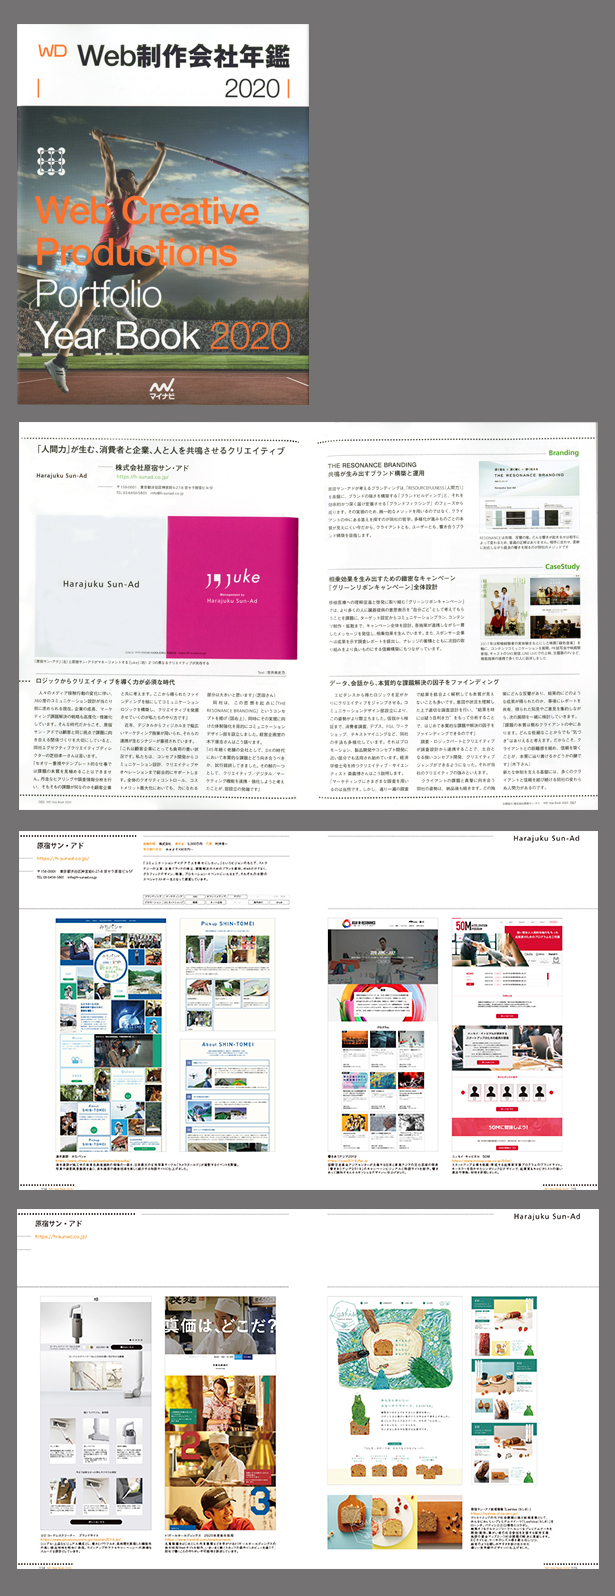 News_web2020